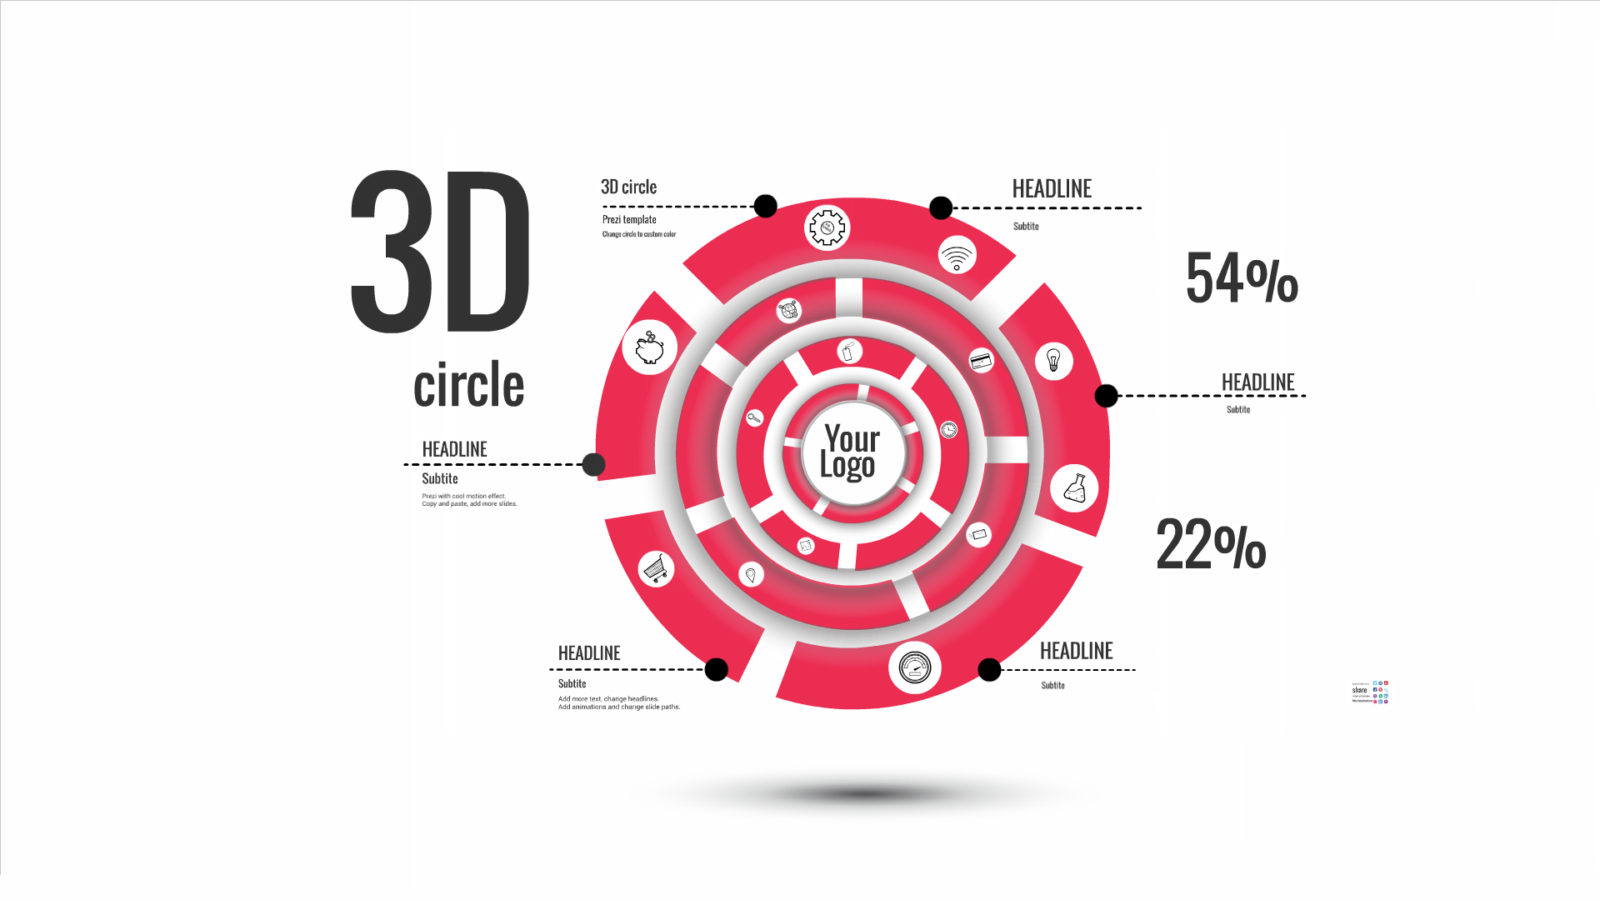 3D circle Prezi template